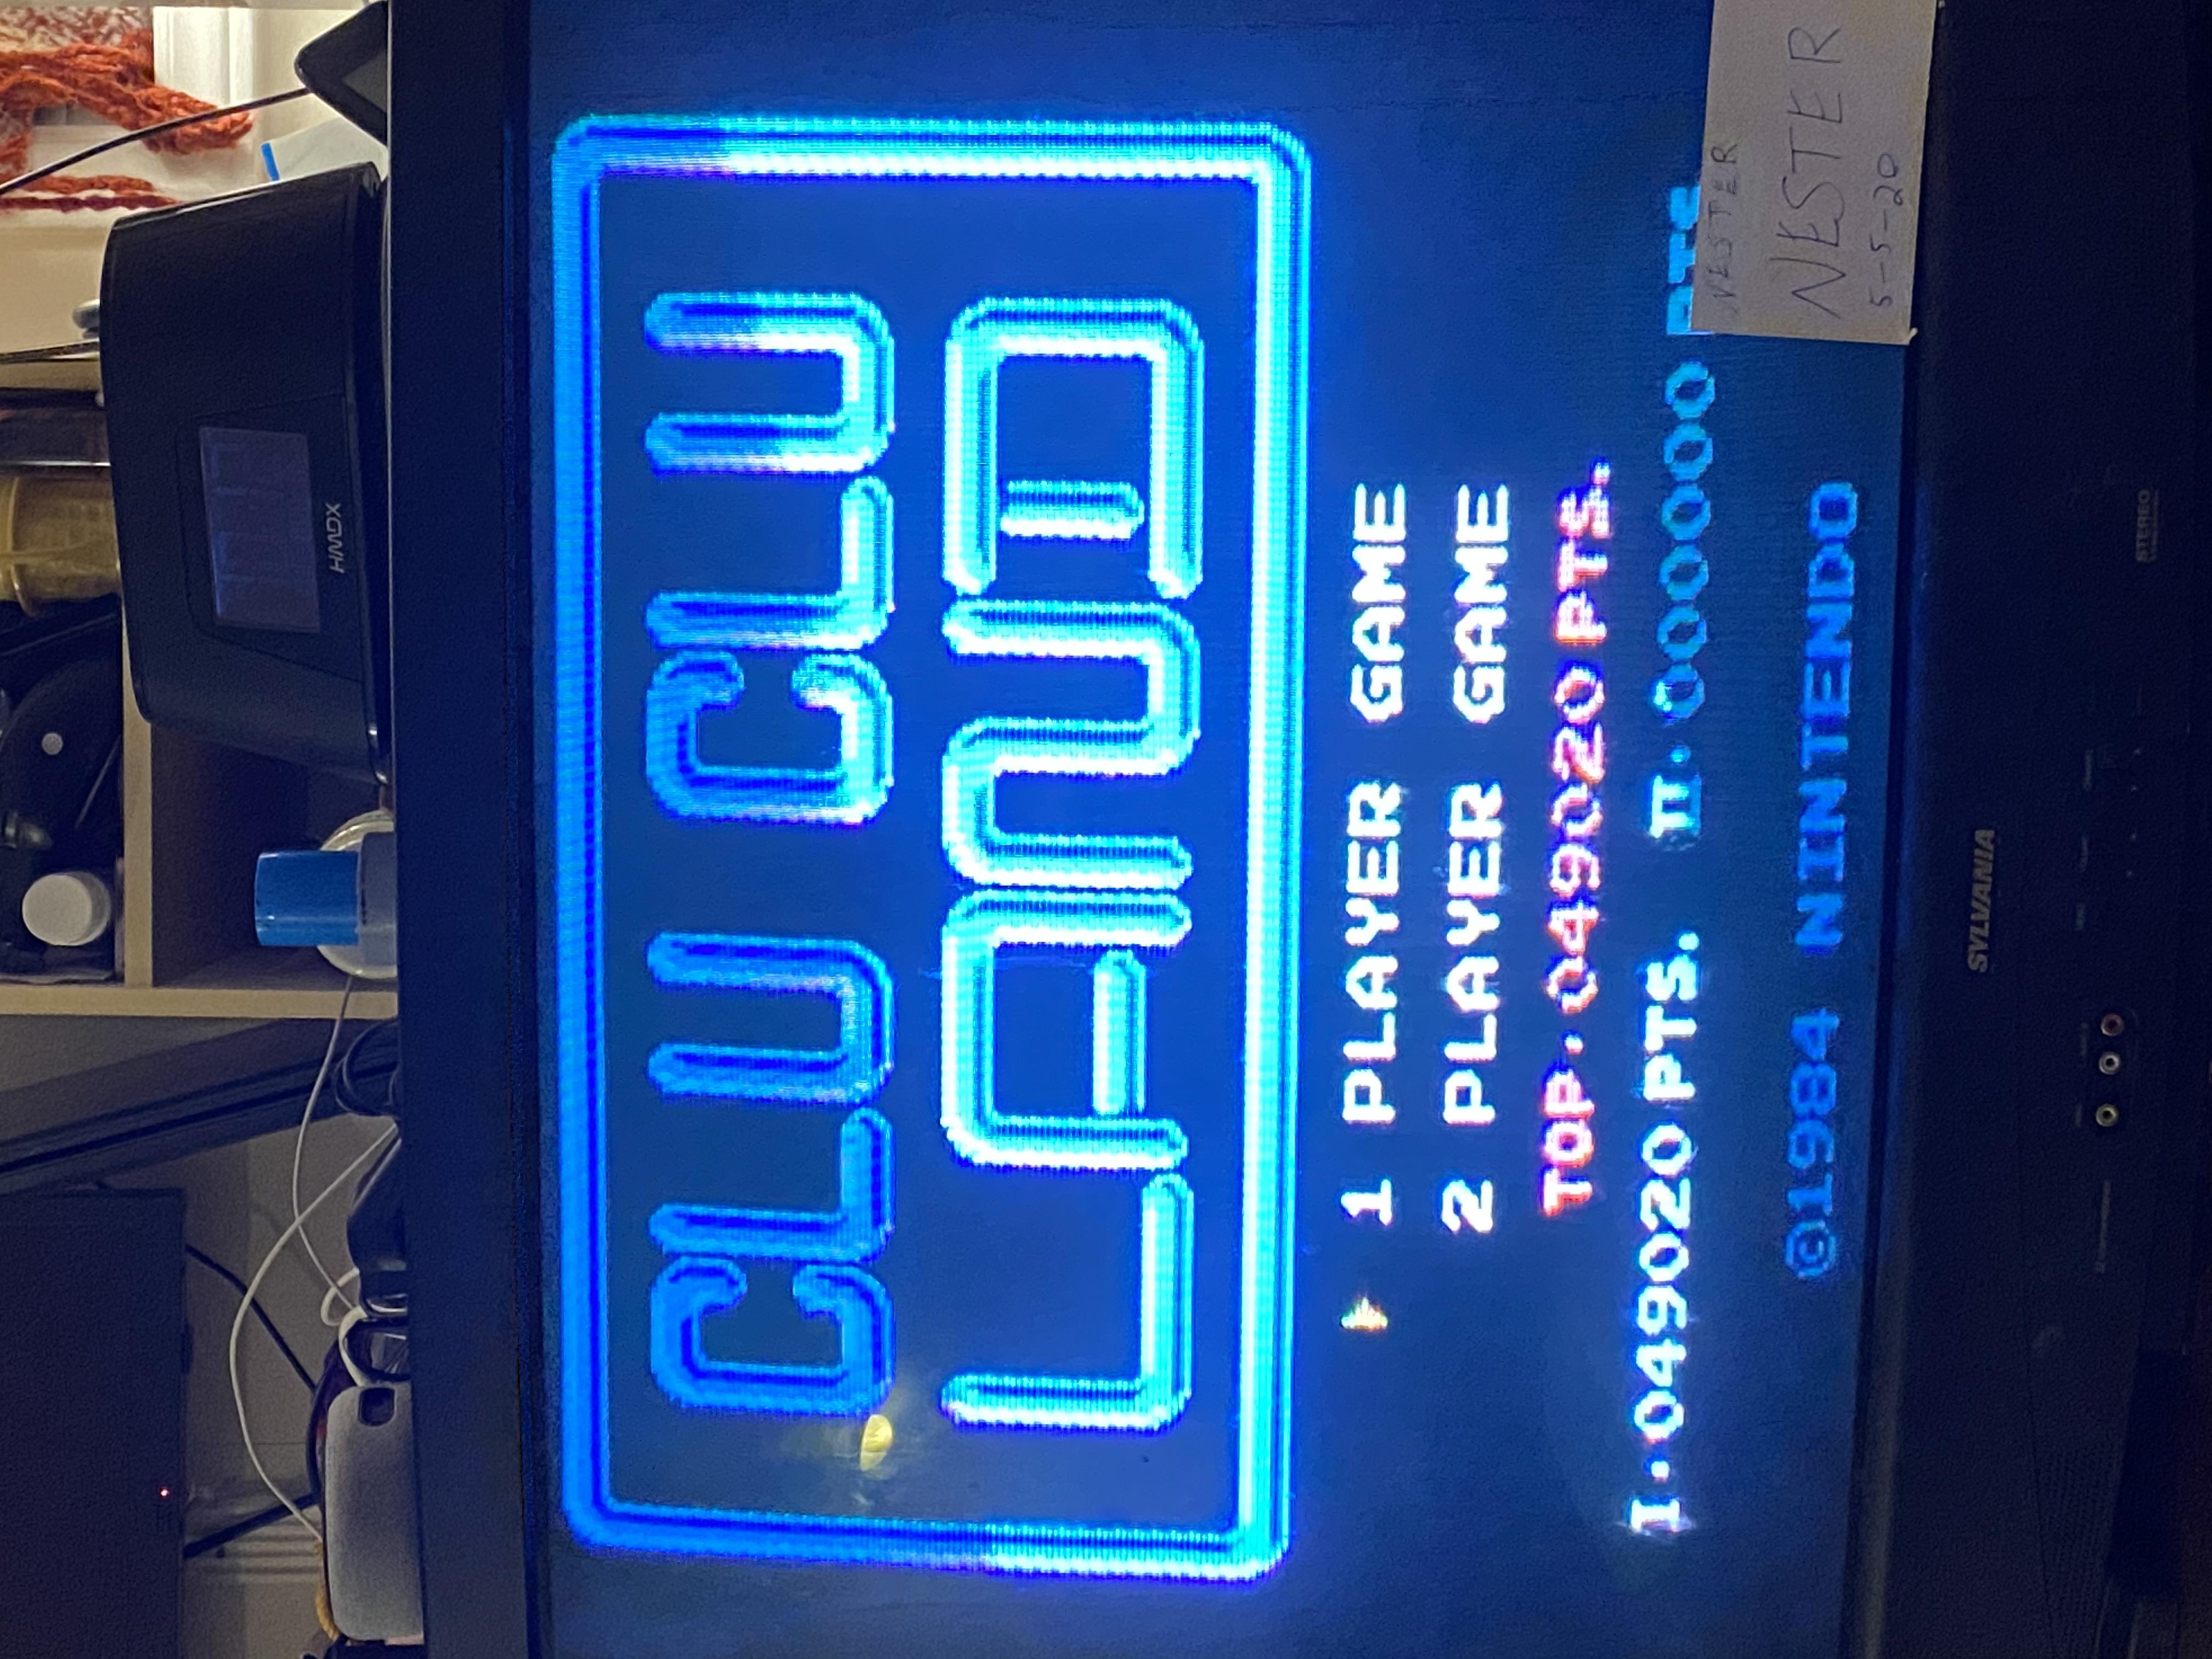 nester: Clu Clu Land (NES/Famicom) 49,020 points on 2020-05-05 21:16:34